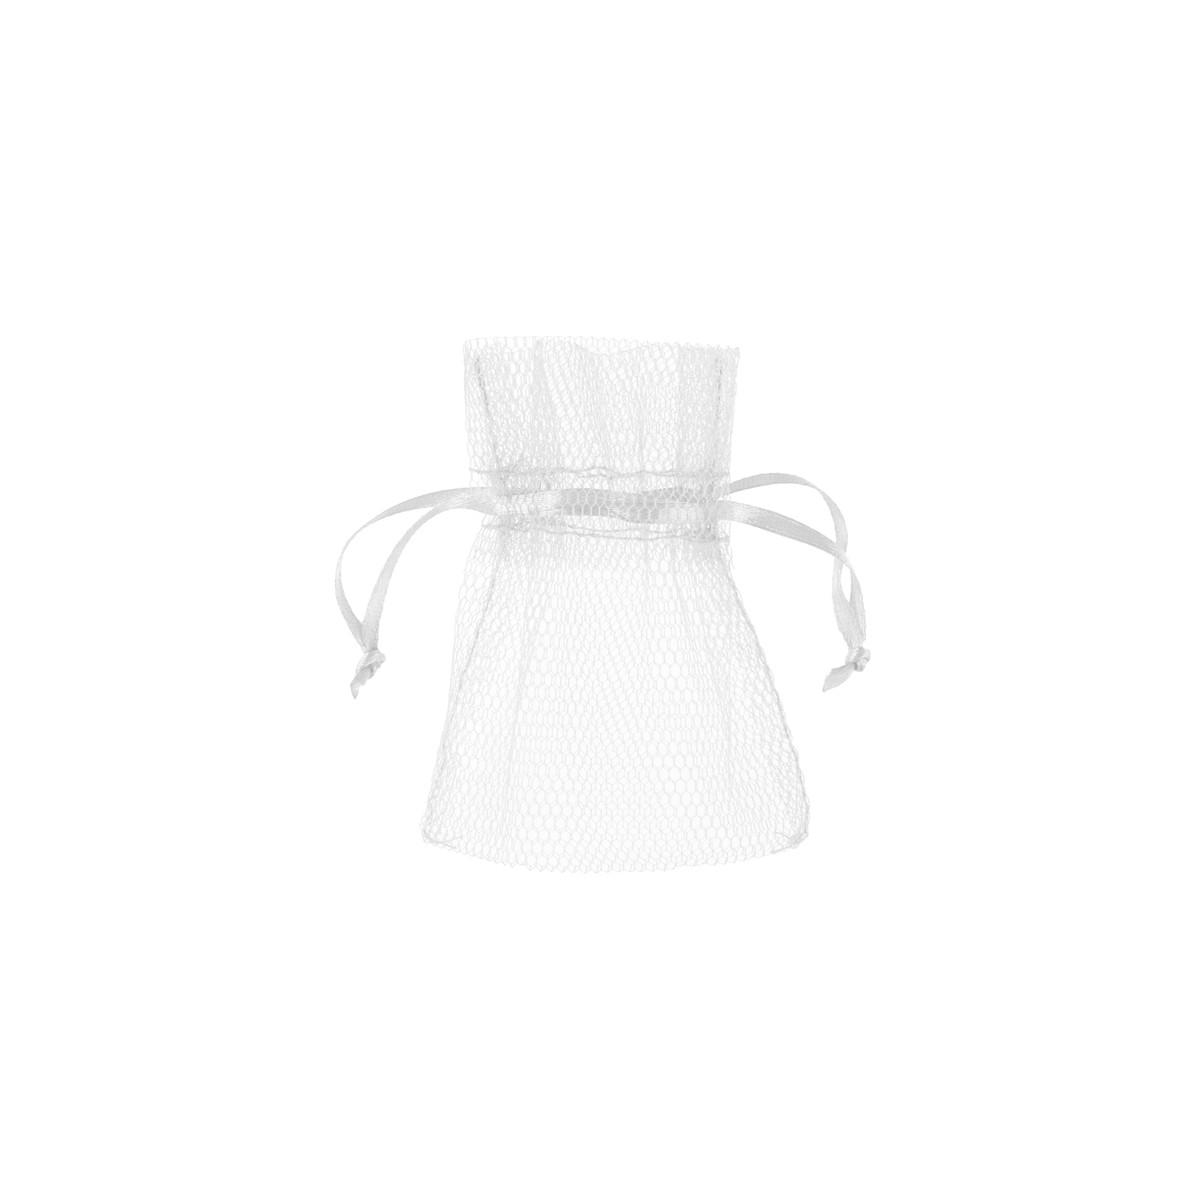 10 x Sachet Dragées Tulle - Blanc